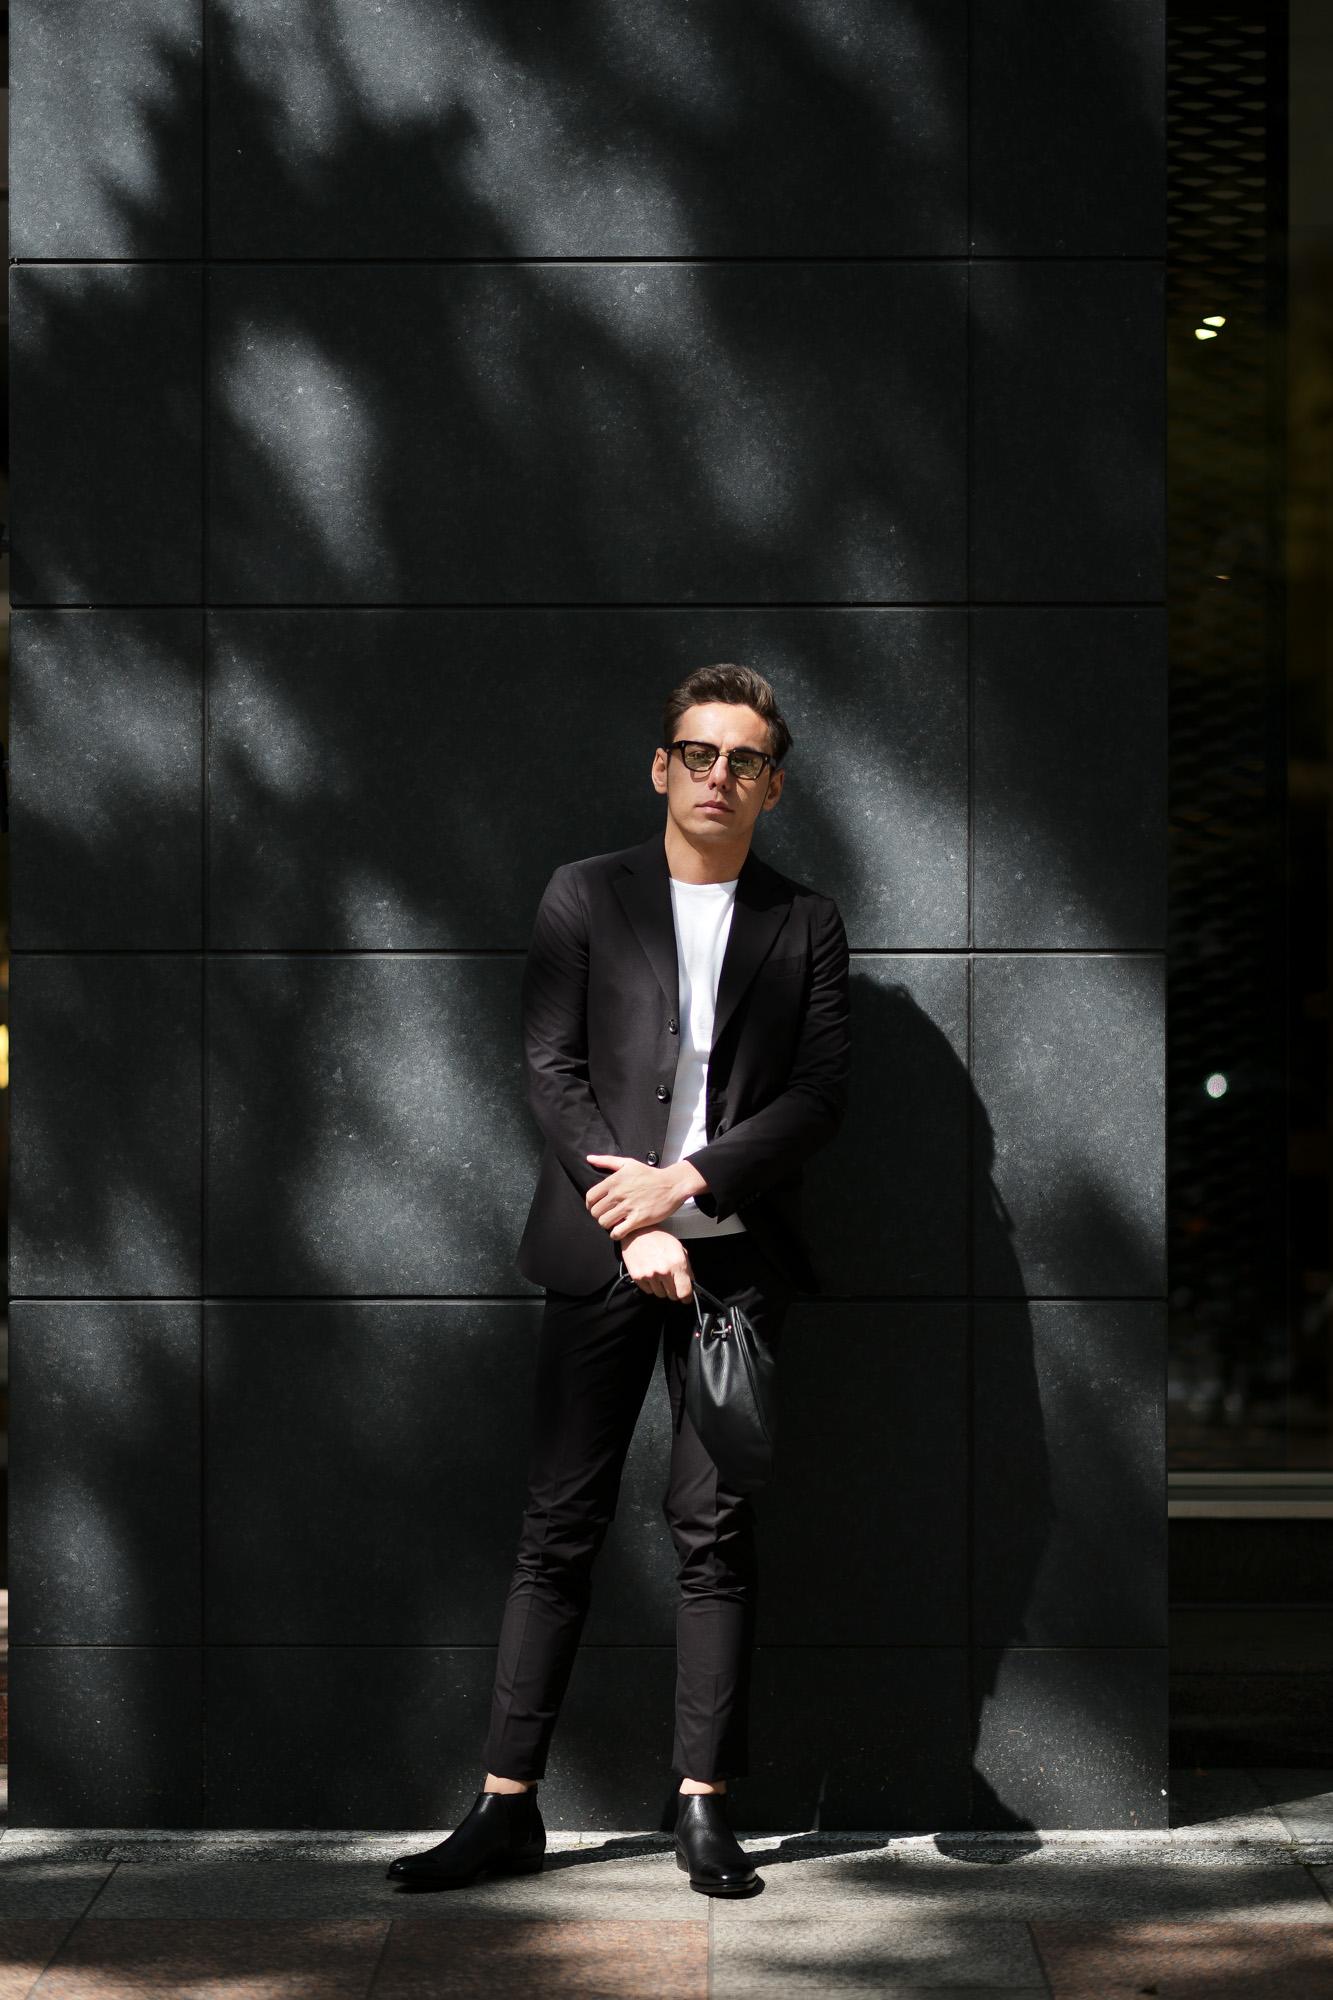 cuervo bopoha (クエルボ ヴァローナ) Sartoria Collection (サルトリア コレクション) Rooster (ルースター) STRETCH NYLON ストレッチナイロン スーツ BLACK(ブラック) MADE IN JAPAN (日本製) 2021 春夏 【Special Model】 【ご予約開始】愛知 名古屋 Alto e Diritto altoediritto アルトエデリット